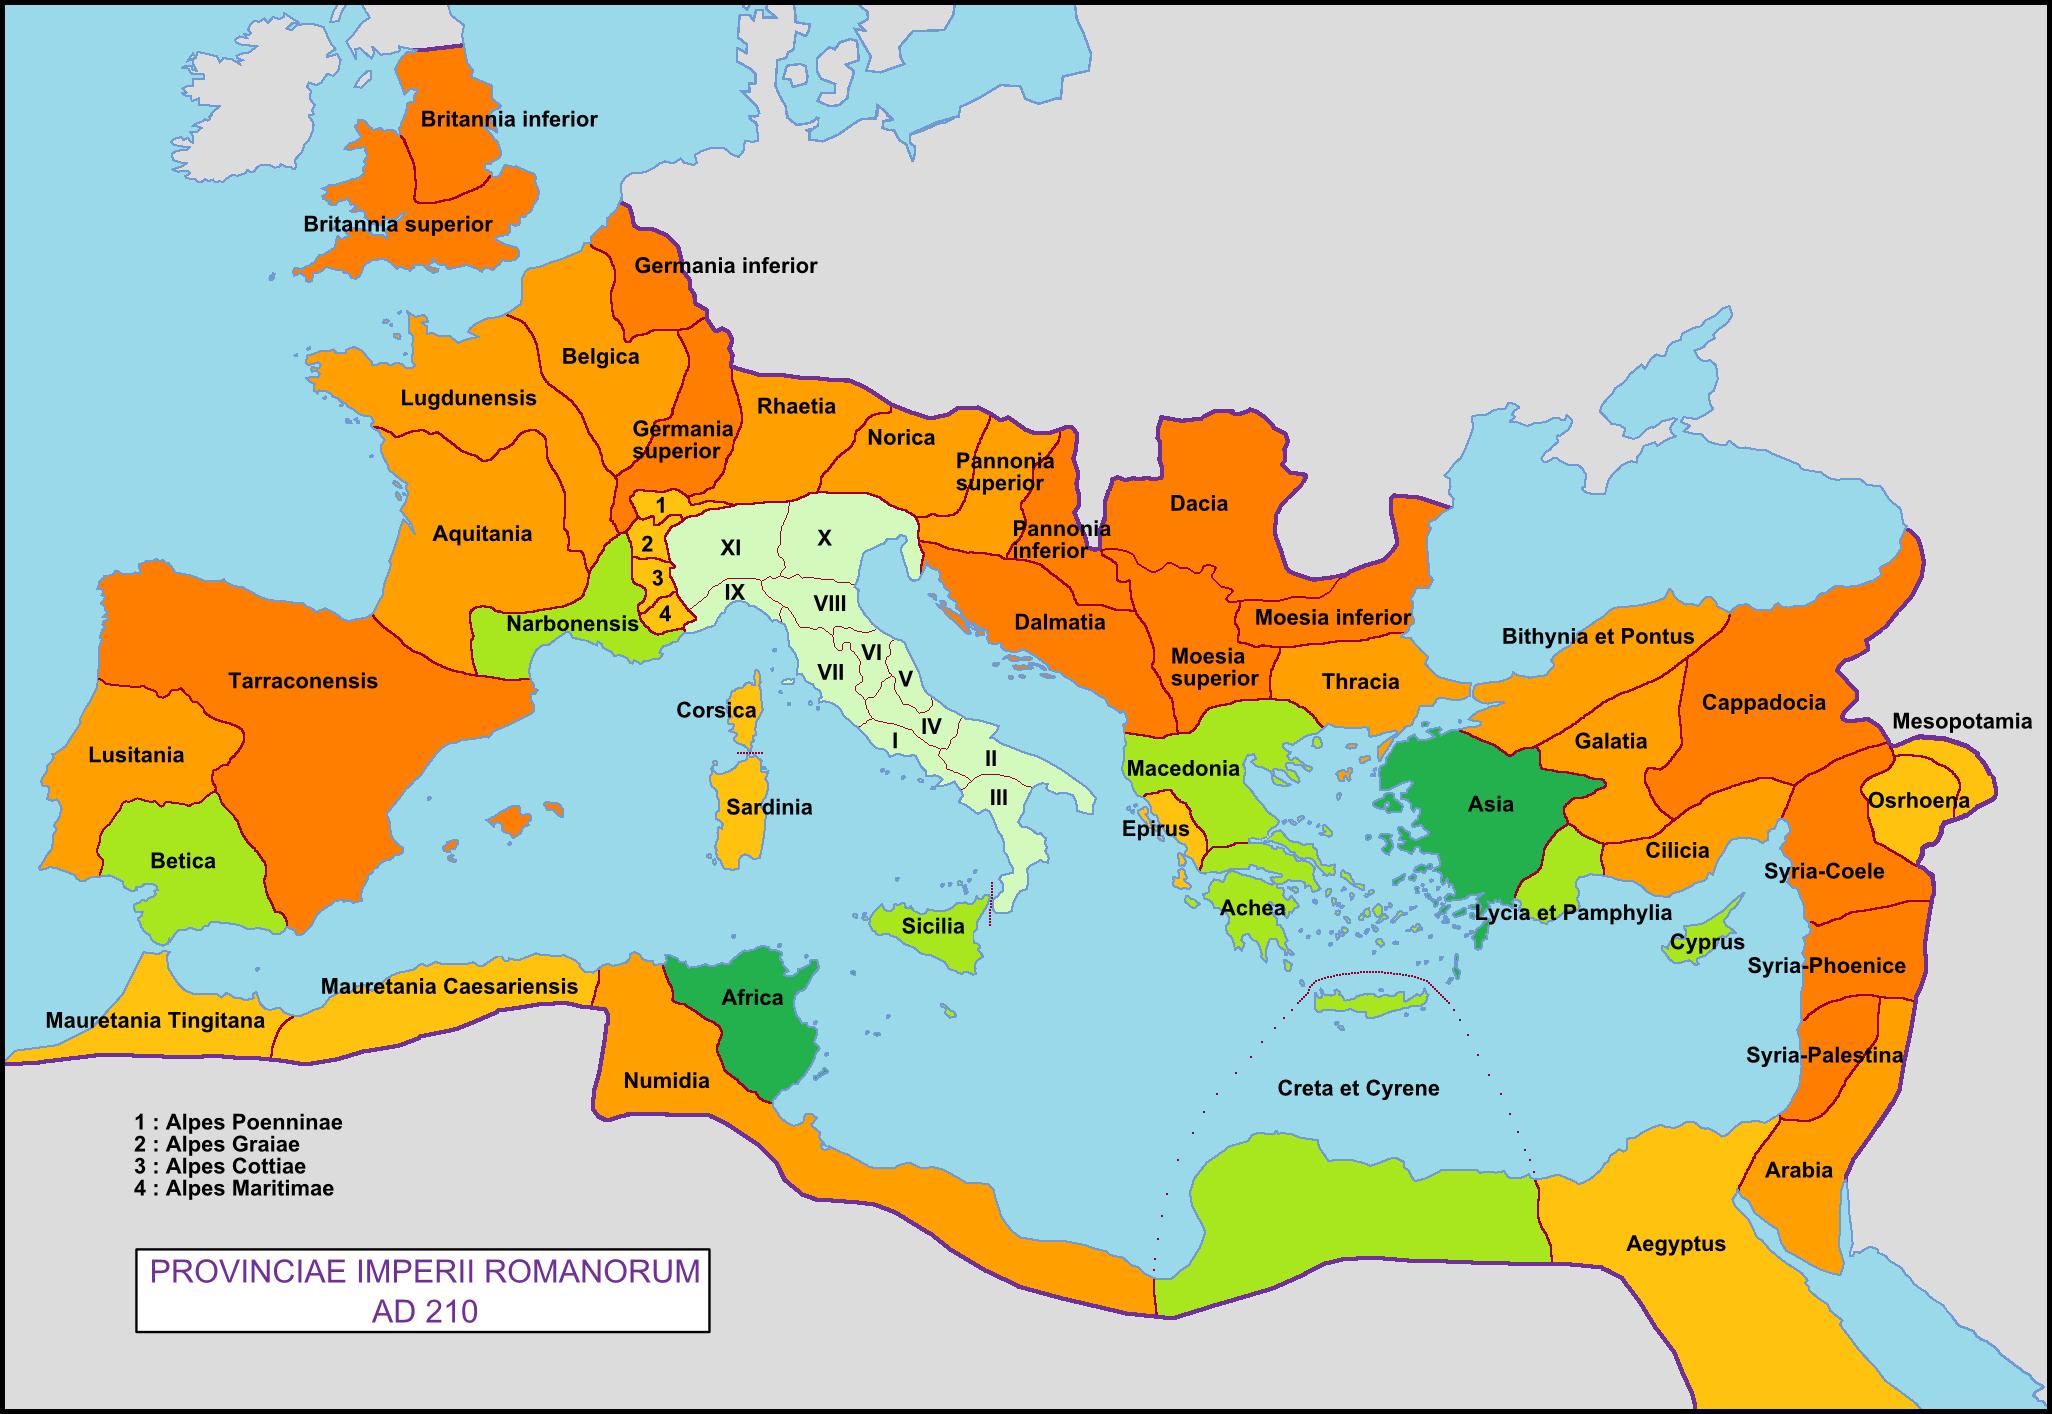 Roman_Empire_with_provinces_in_210_AD